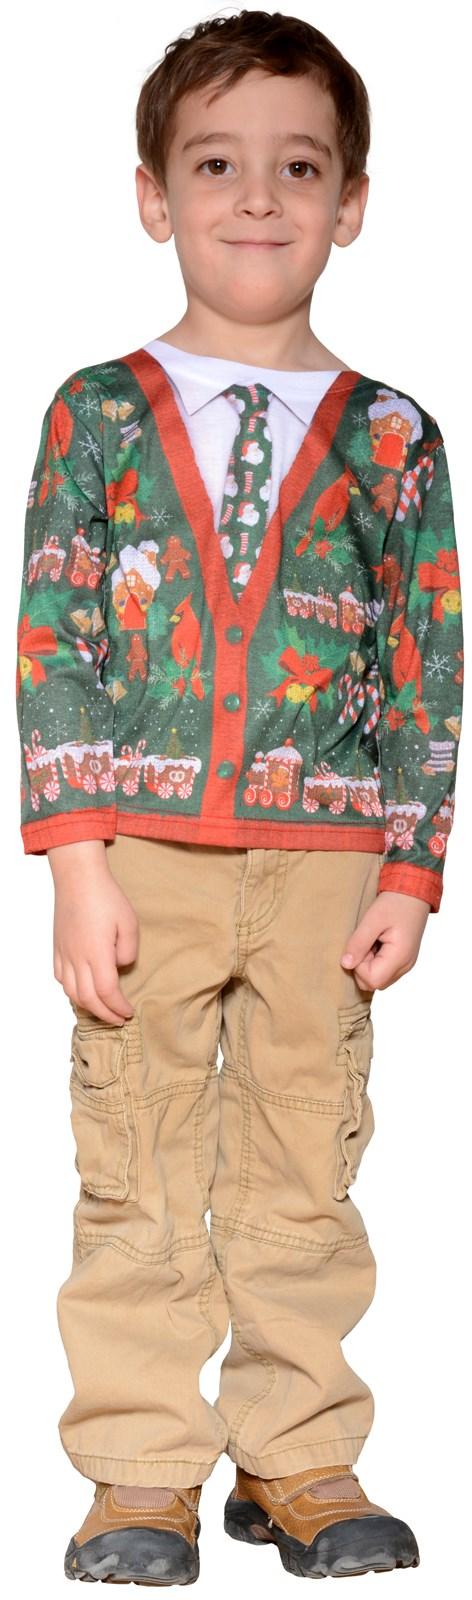 Toddler Ugly Christmas Cardigan